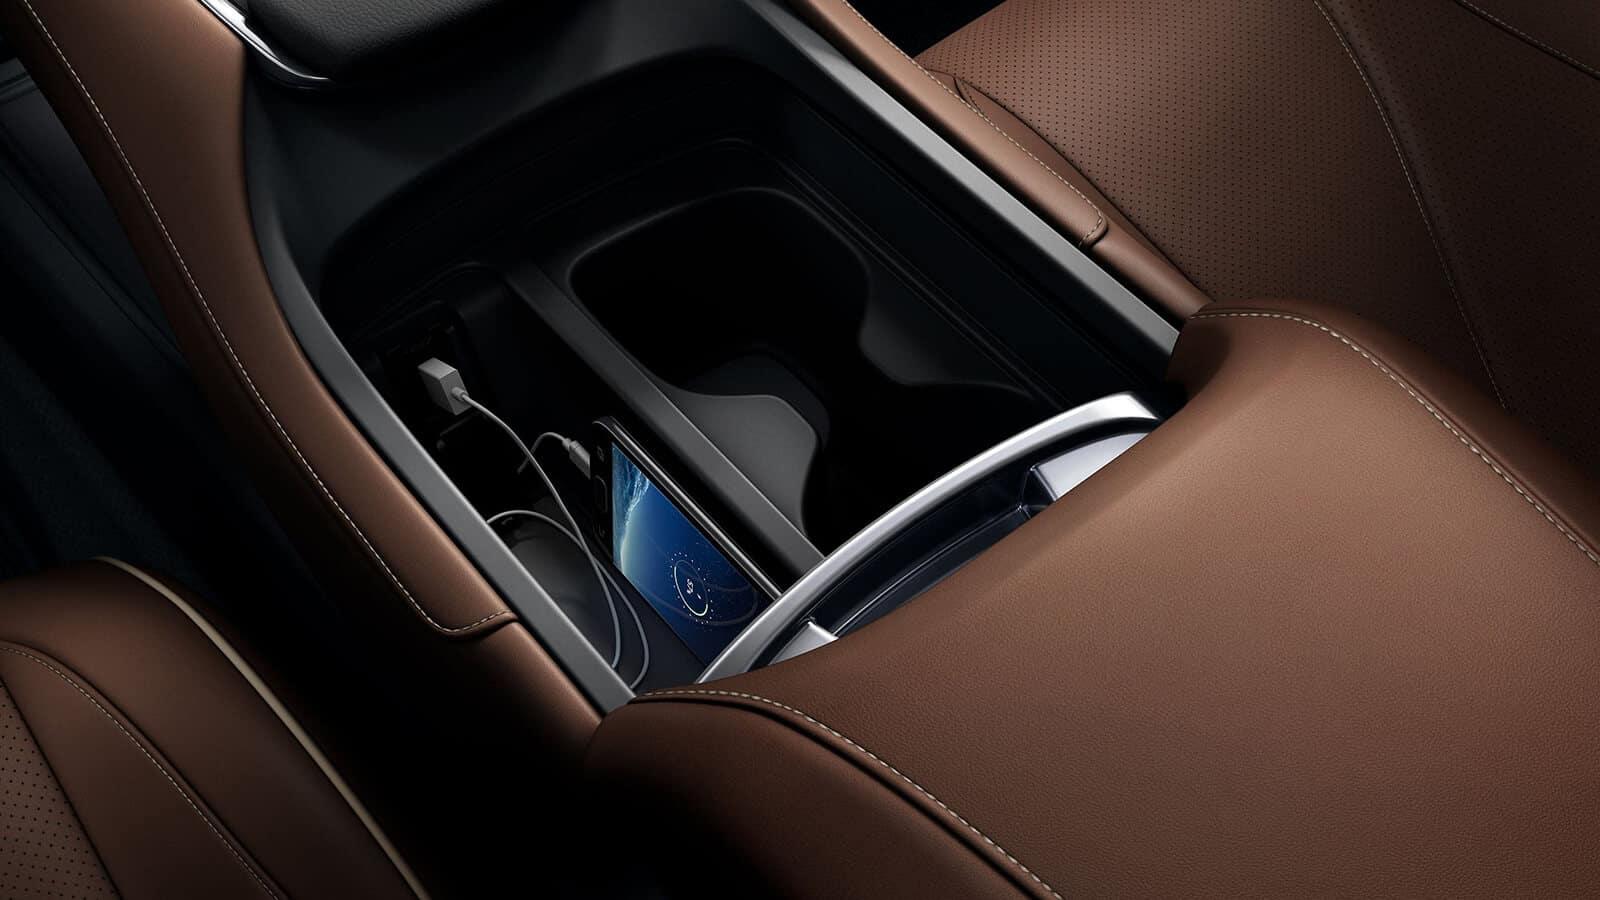 2020 Acura RDX Interior Center Console Functionality